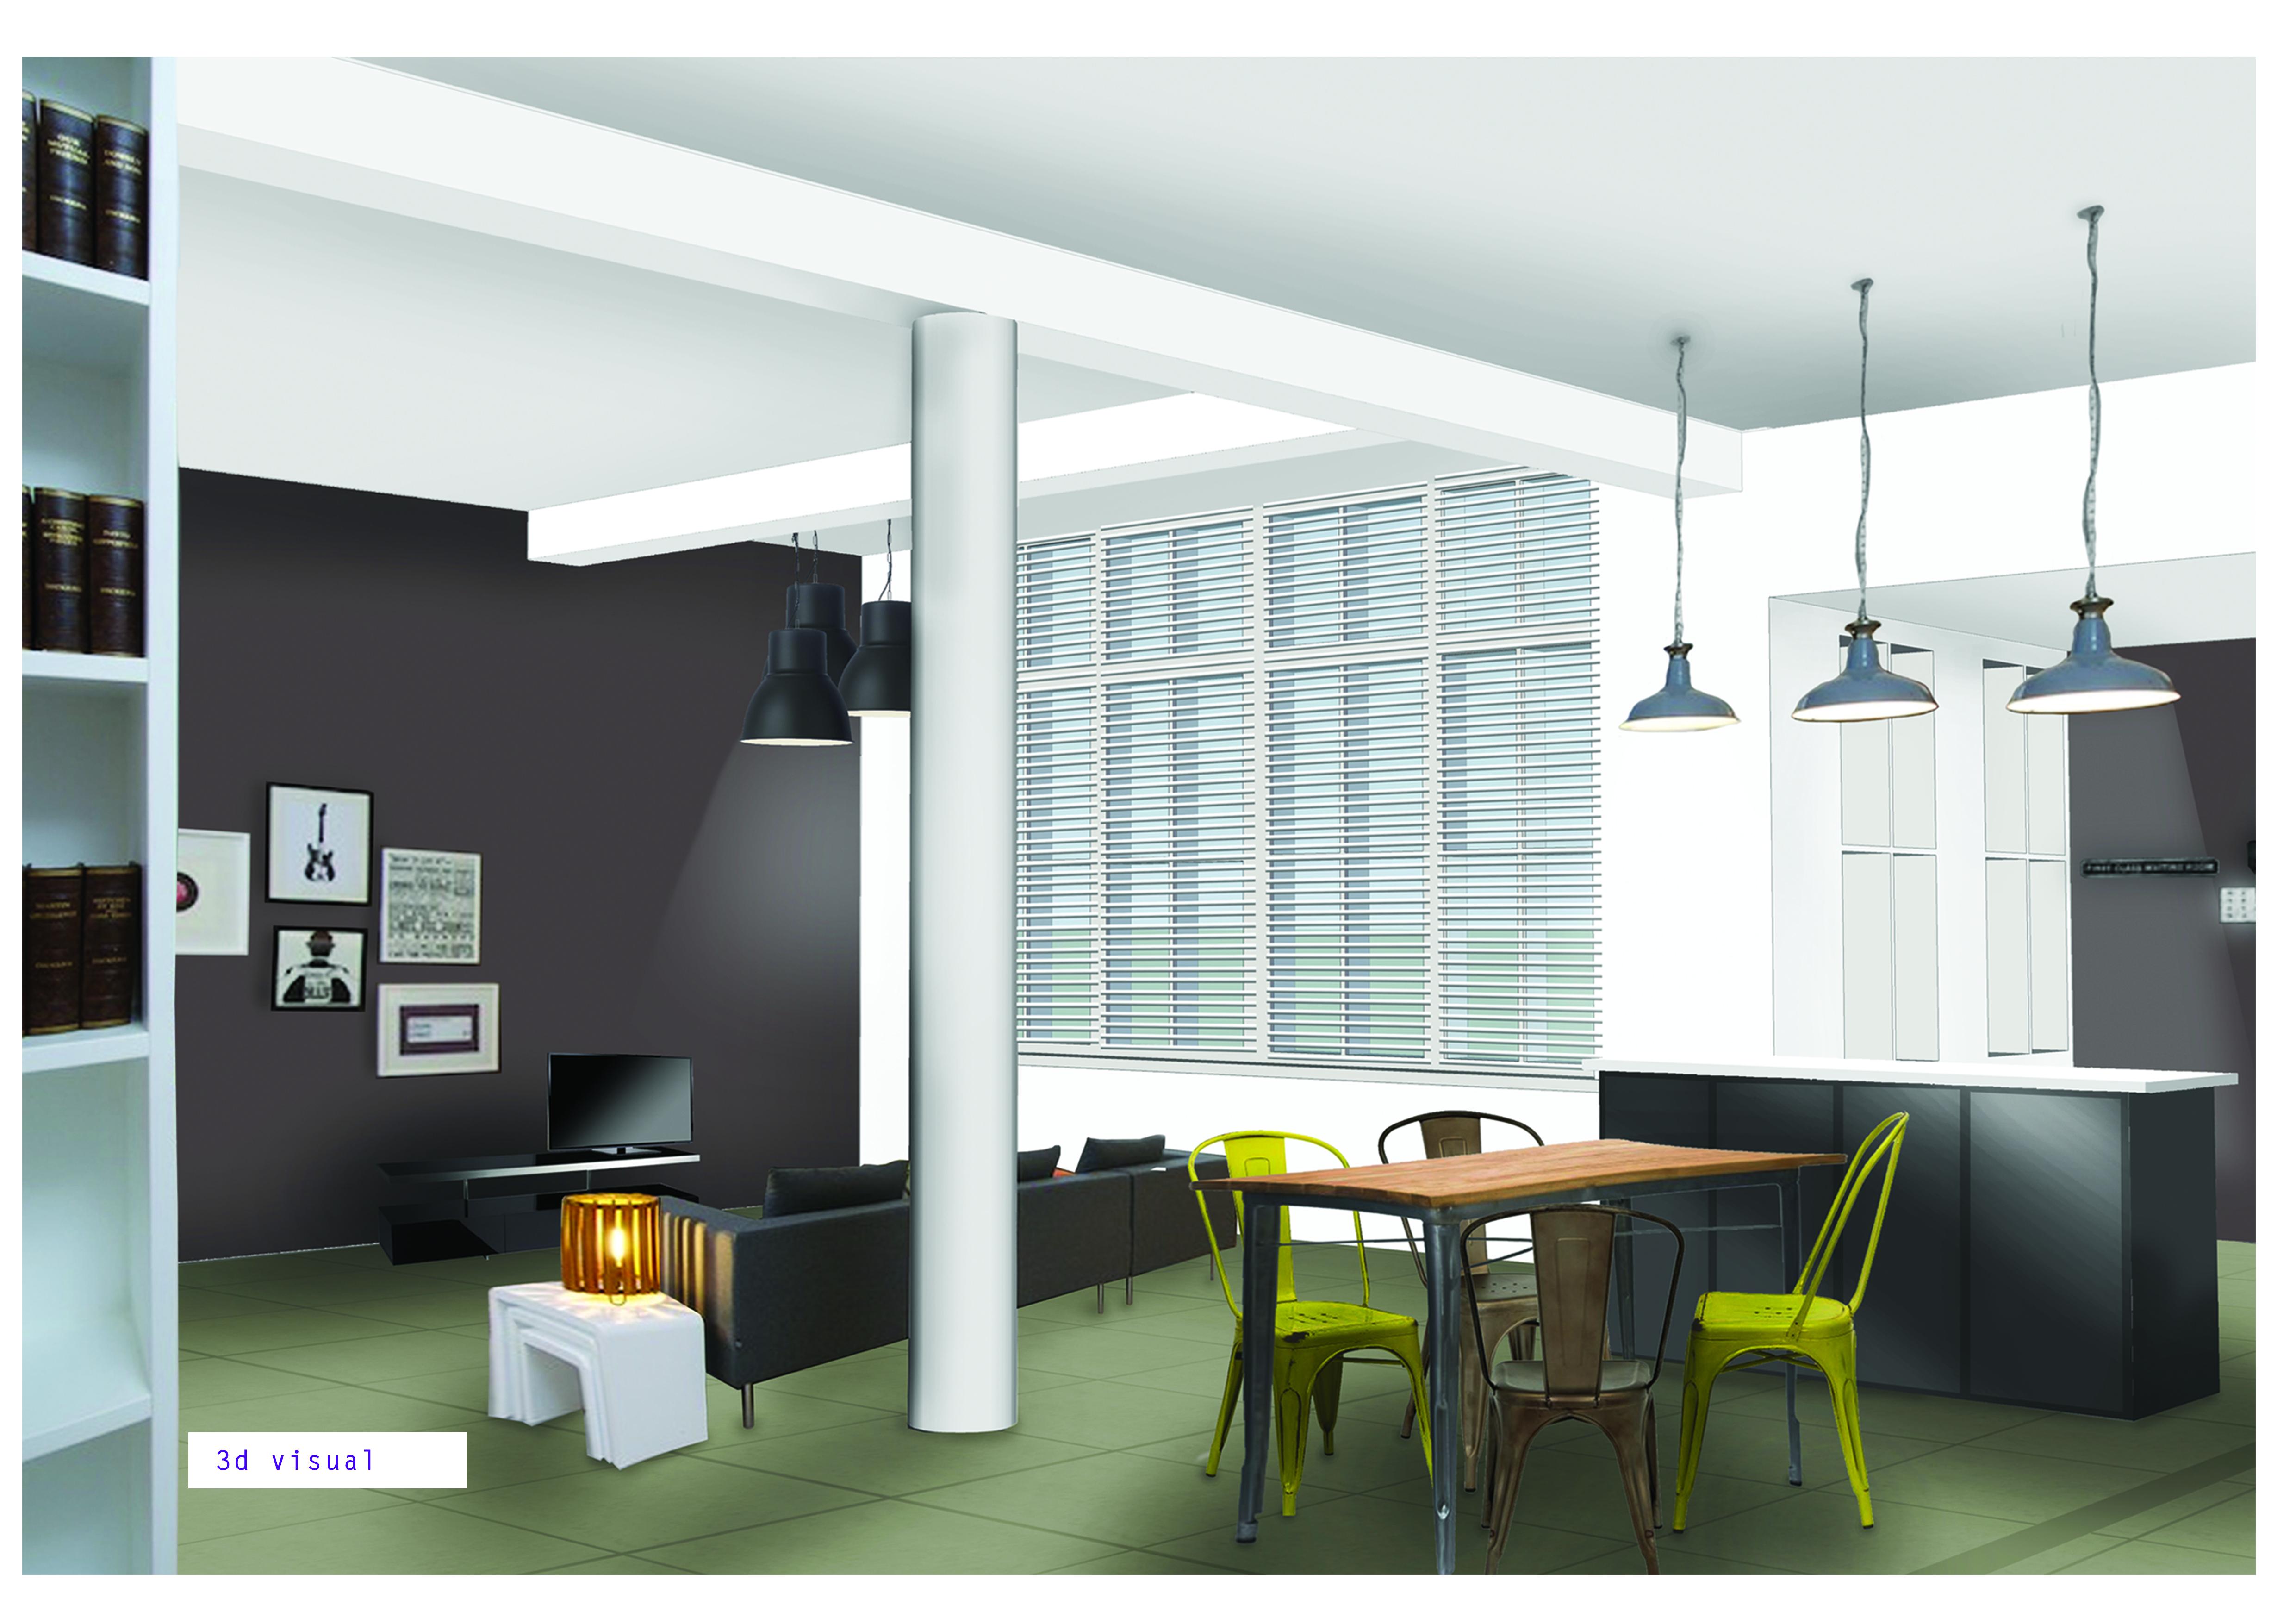 London flat visual 1 commercial interior design by karen for Commercial interior design london